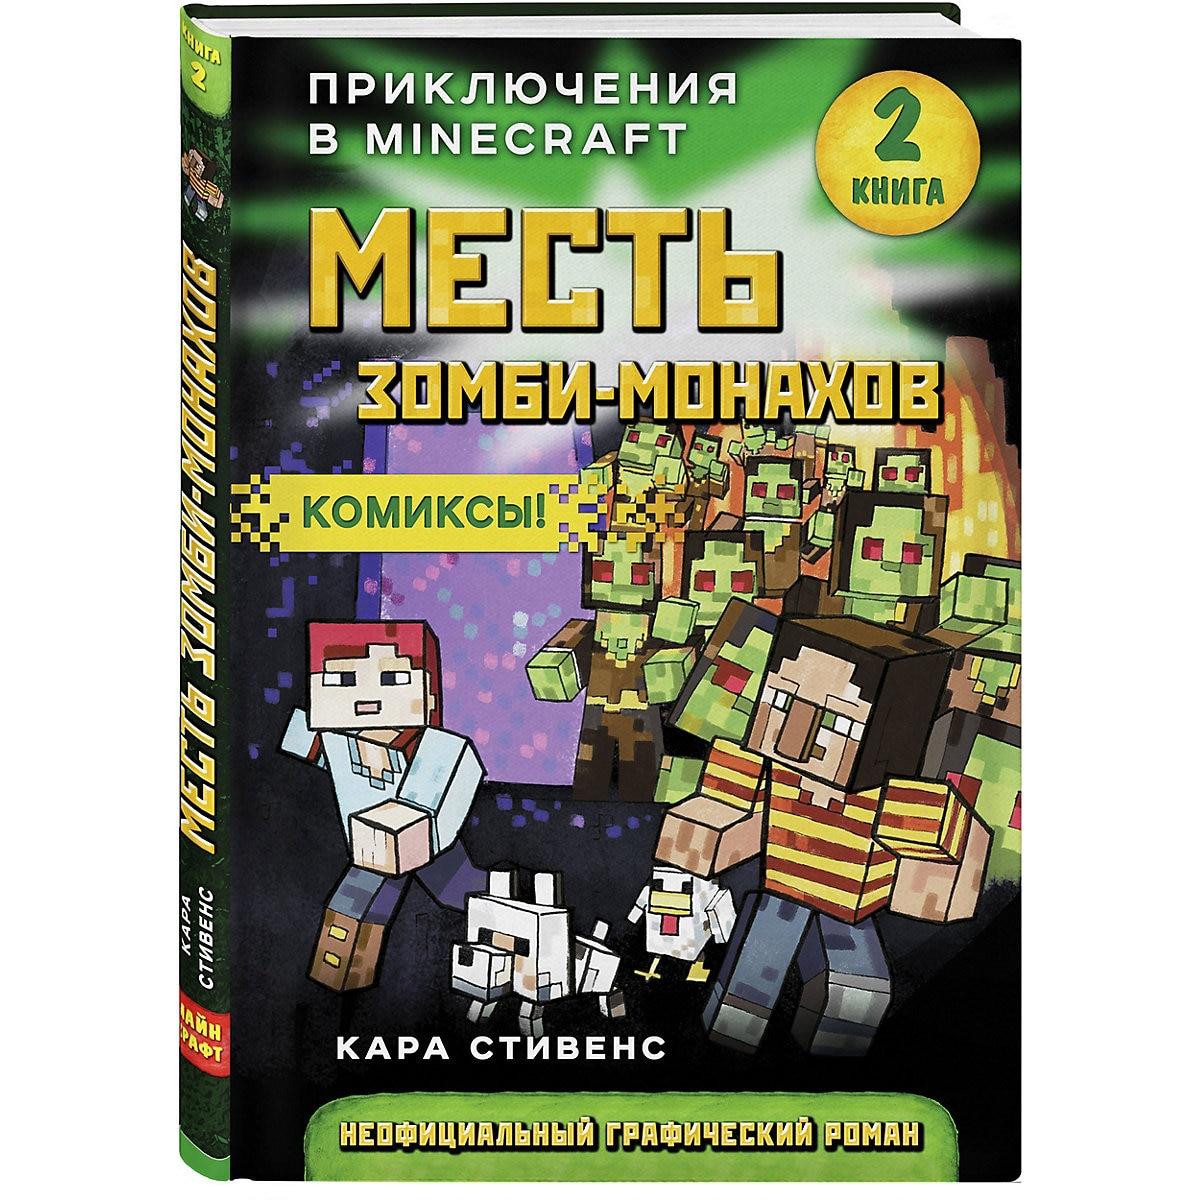 Books EKSMO 9556063 Children Education Encyclopedia Alphabet Dictionary Book For Baby MTpromo